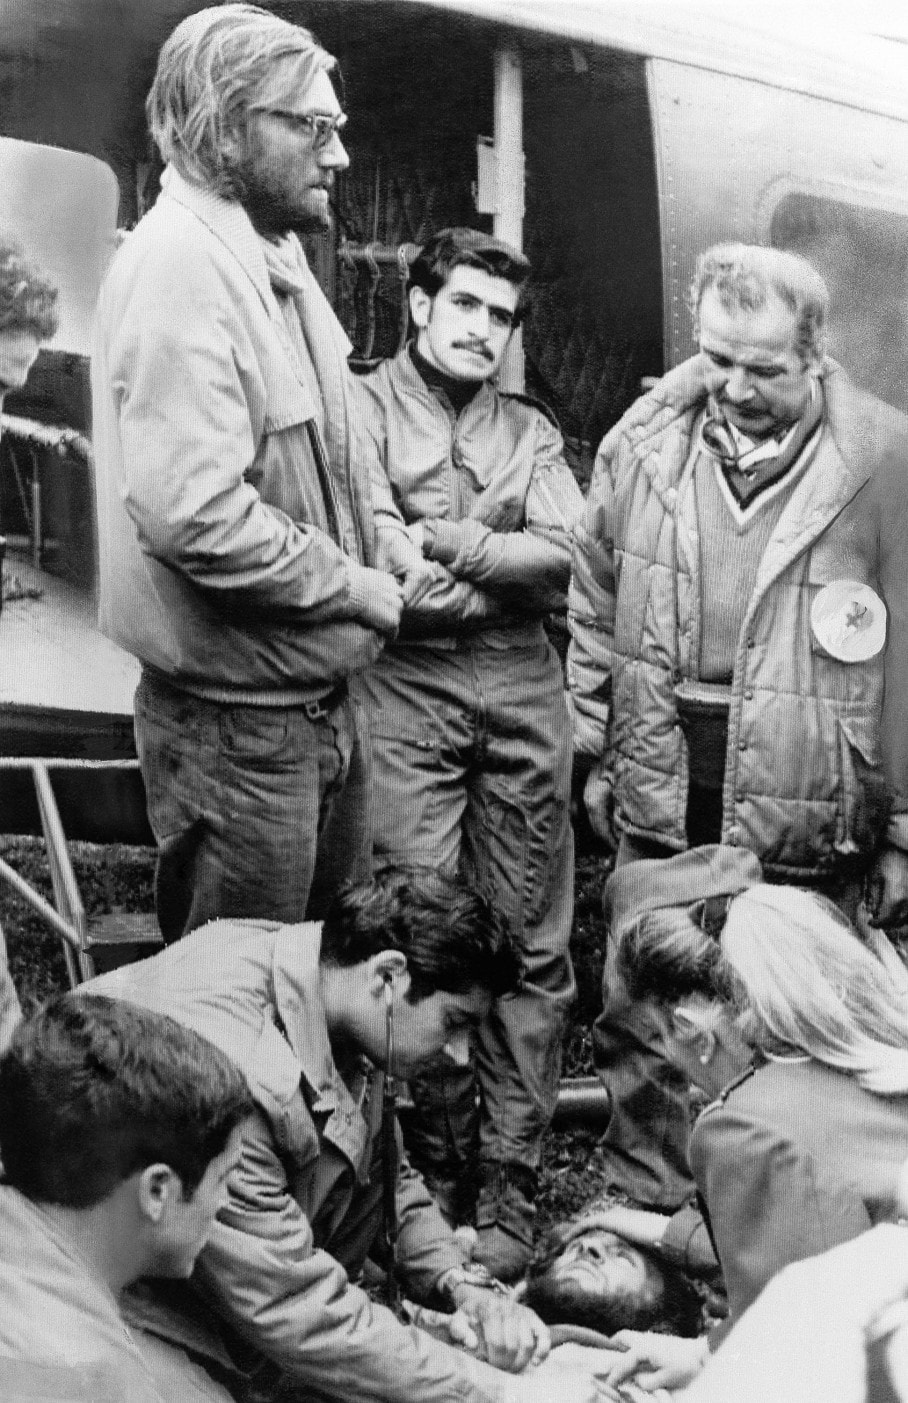 medics examine the survivors of the Uruguayan Air Force Flight 571